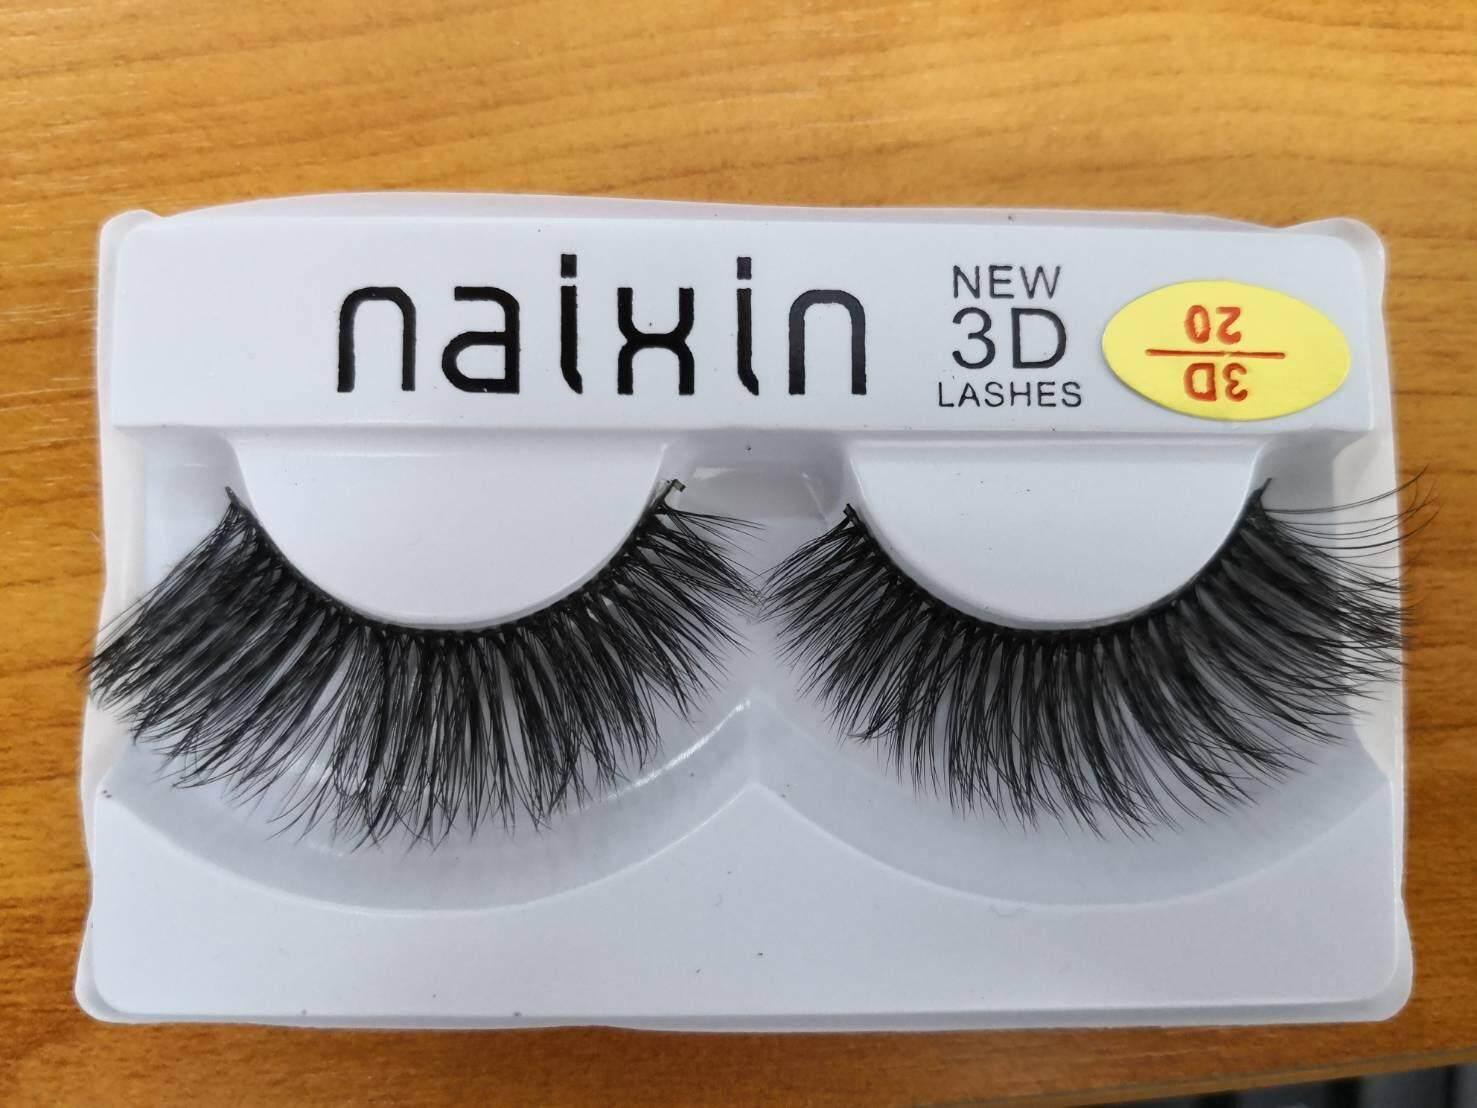 3d Naixin ขนตาปลอมขนนิ่ม ไม่หนักตา คมทุกจุด ดูเป็นธรรมชาติ ราคาถูกขนตาปลอมยอดฮิต By Meemieshop.